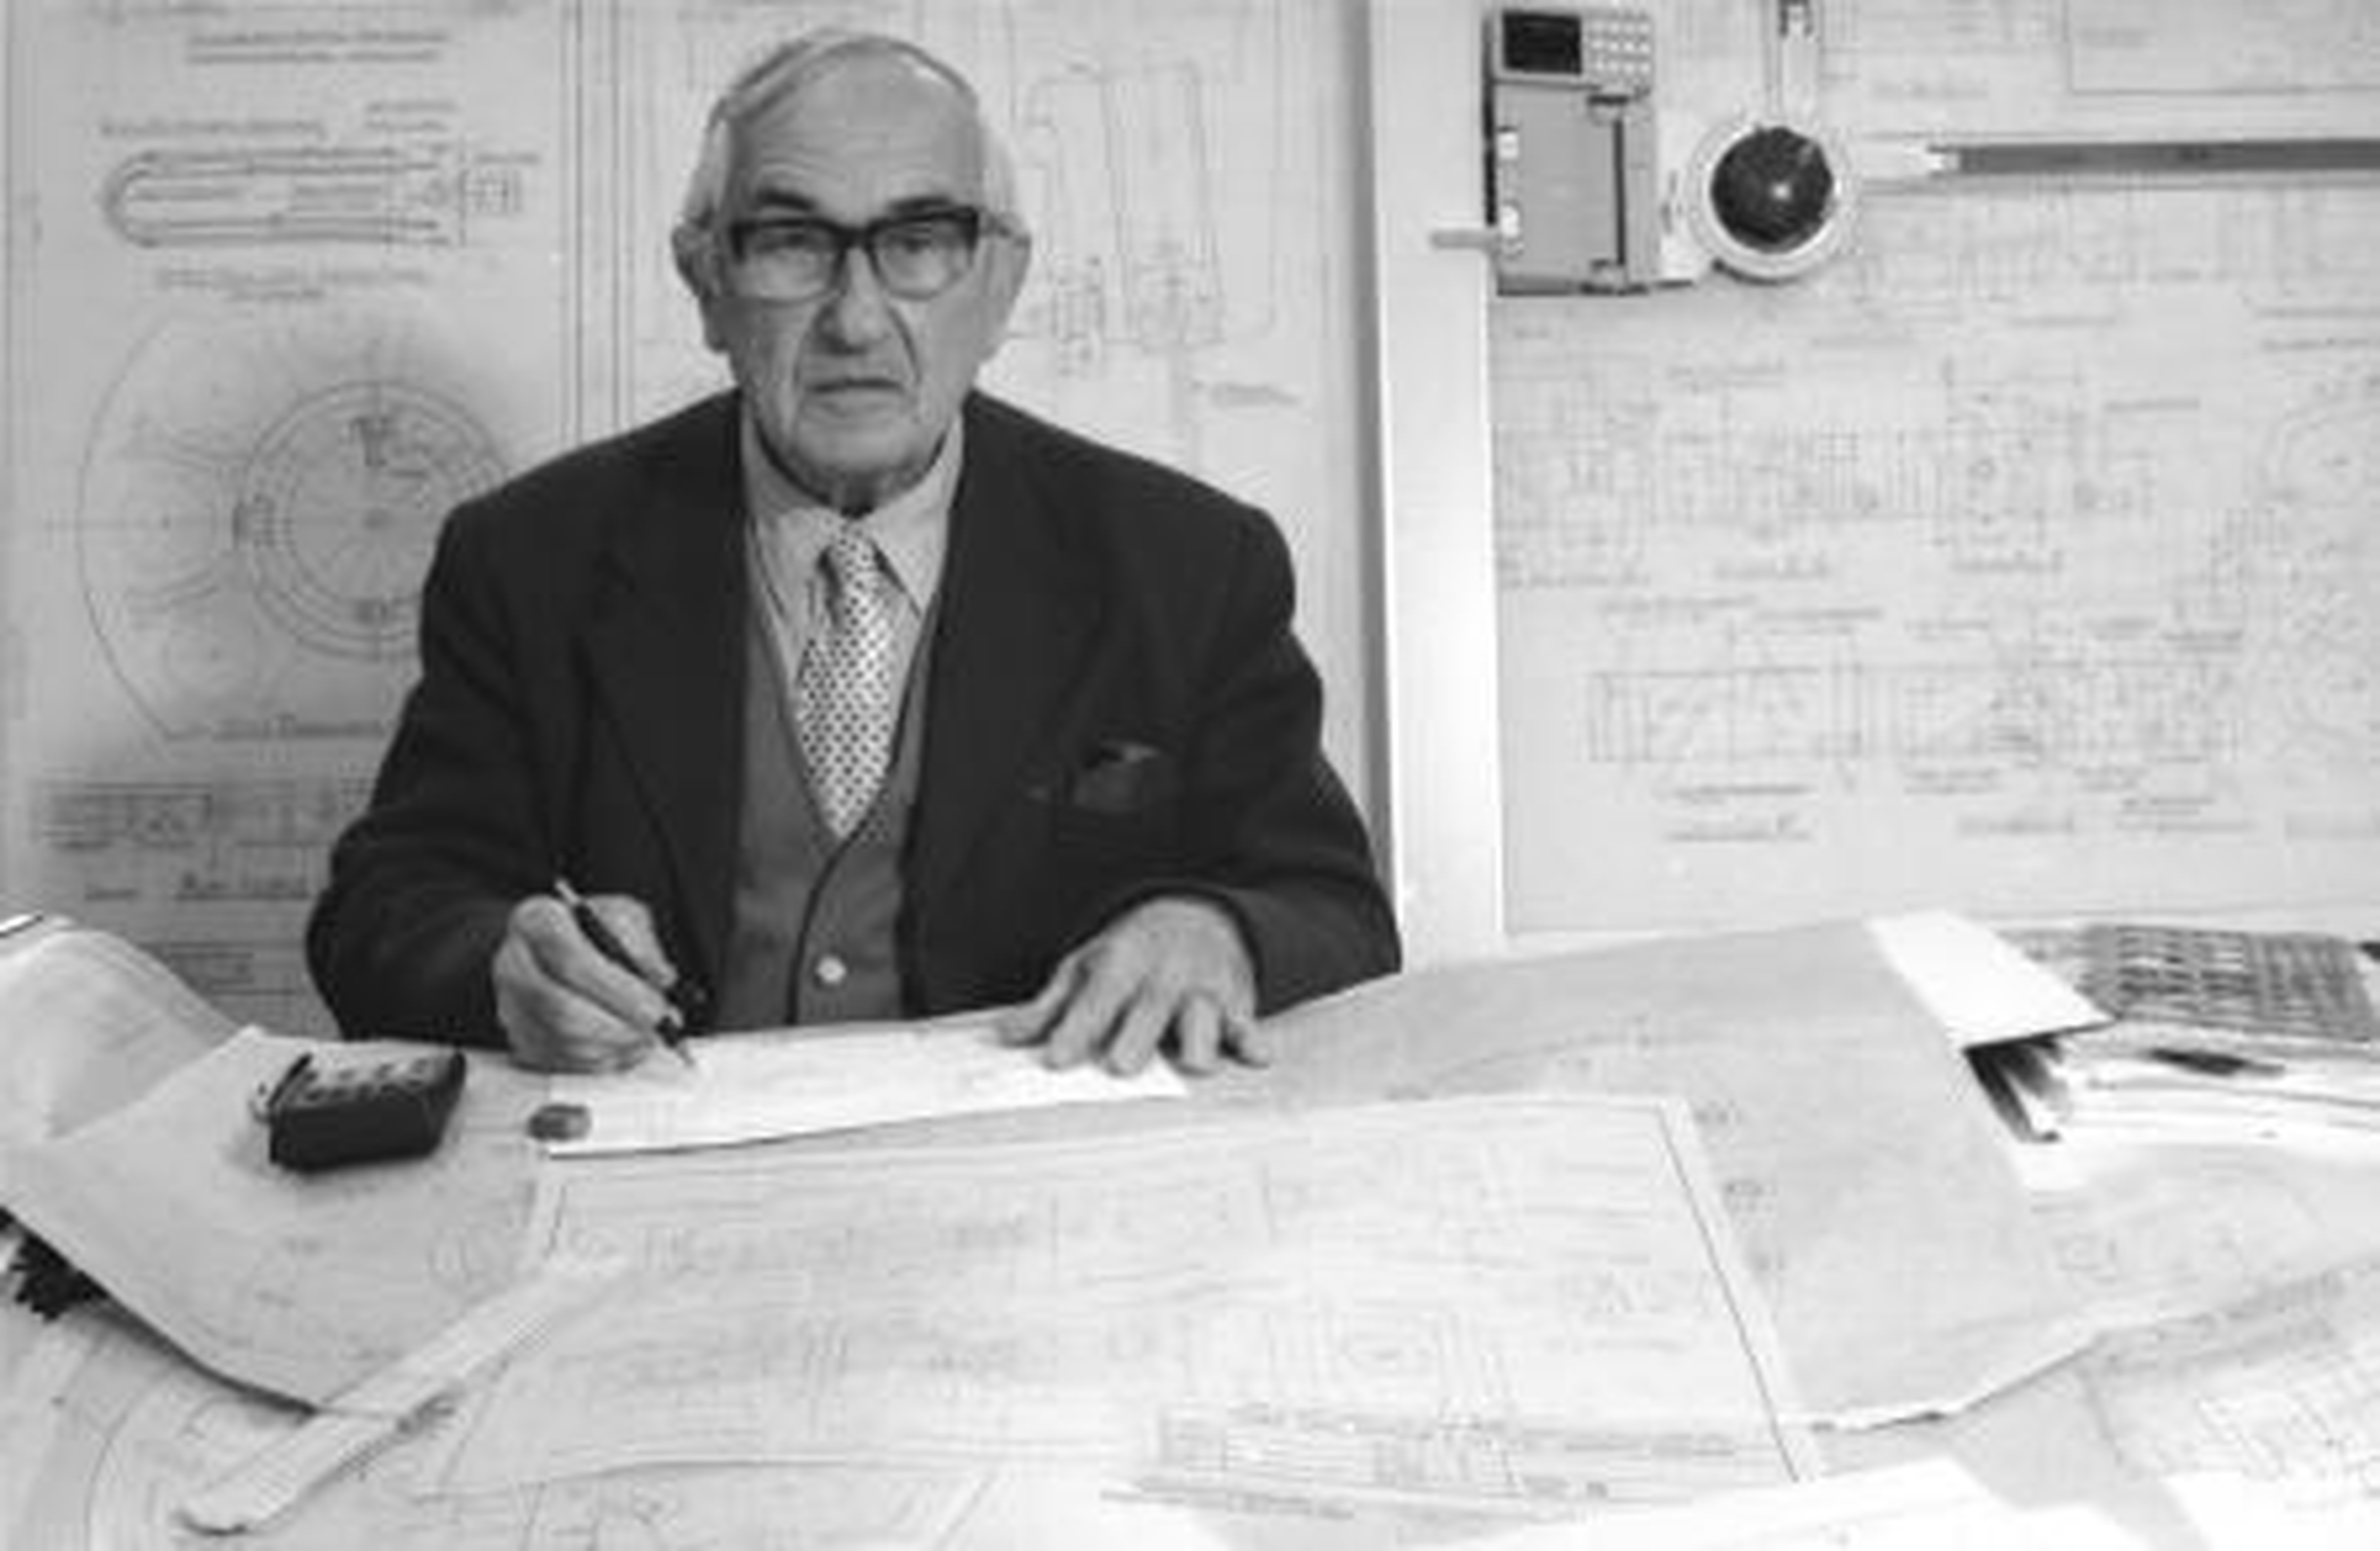 Robert Clark and wave power designs, Edinburgh 1985.